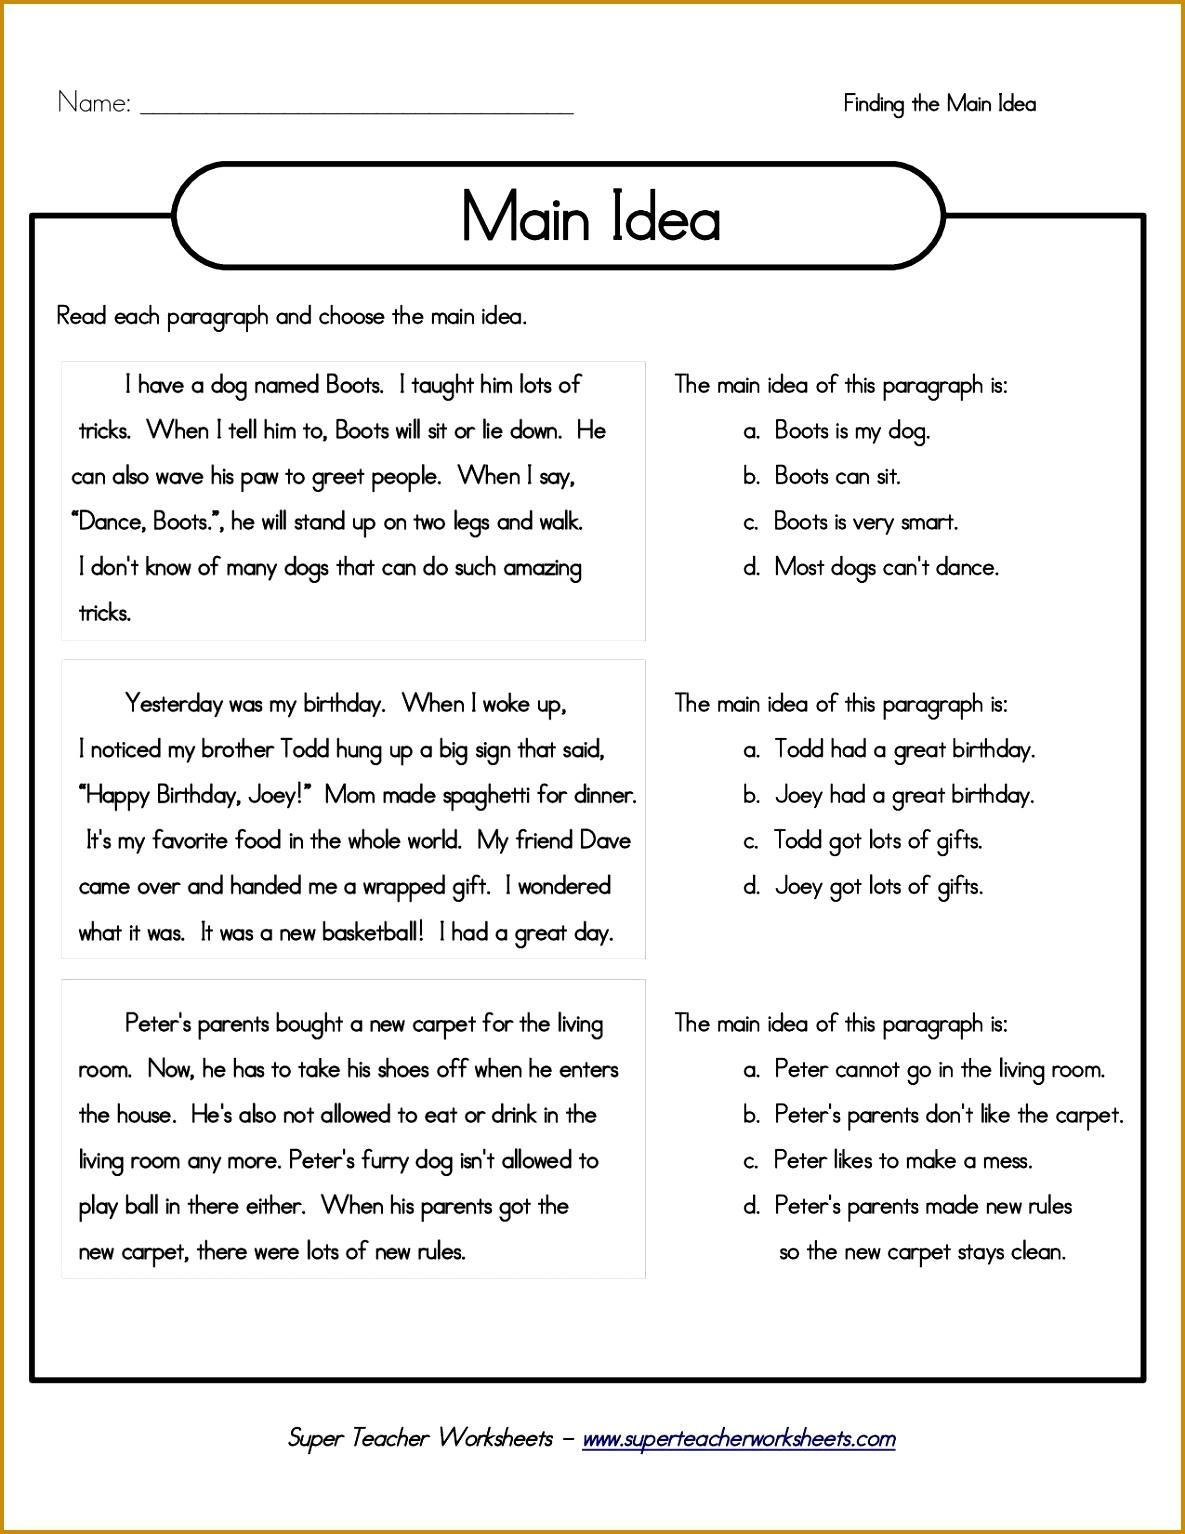 7 Super Teacher Worksheets Login